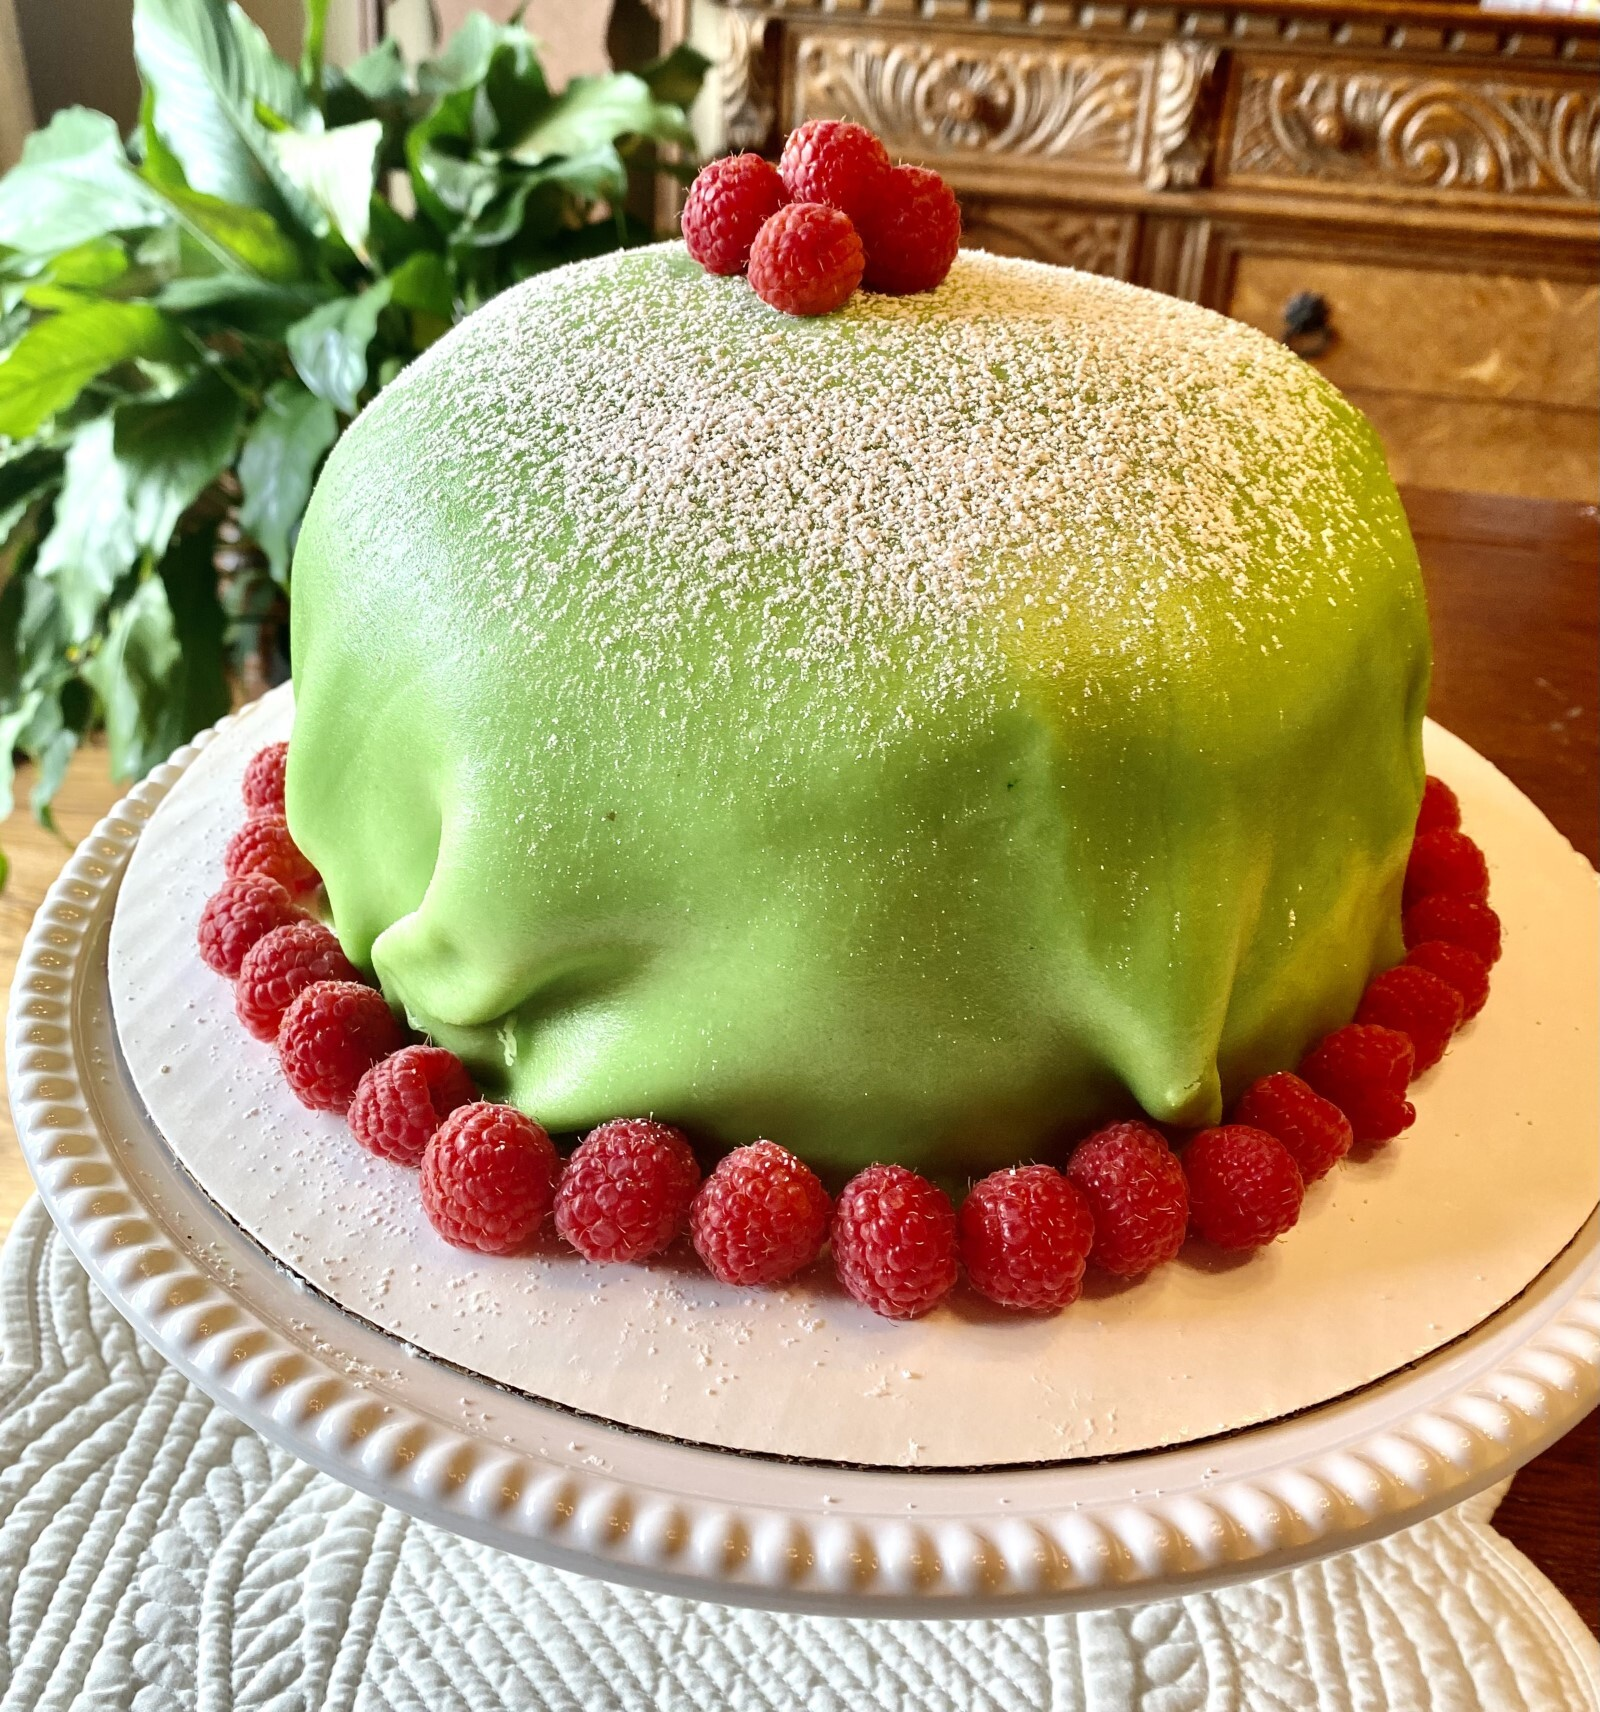 Prinsesstårta (Swedish Princess Cake) Trusted Brands